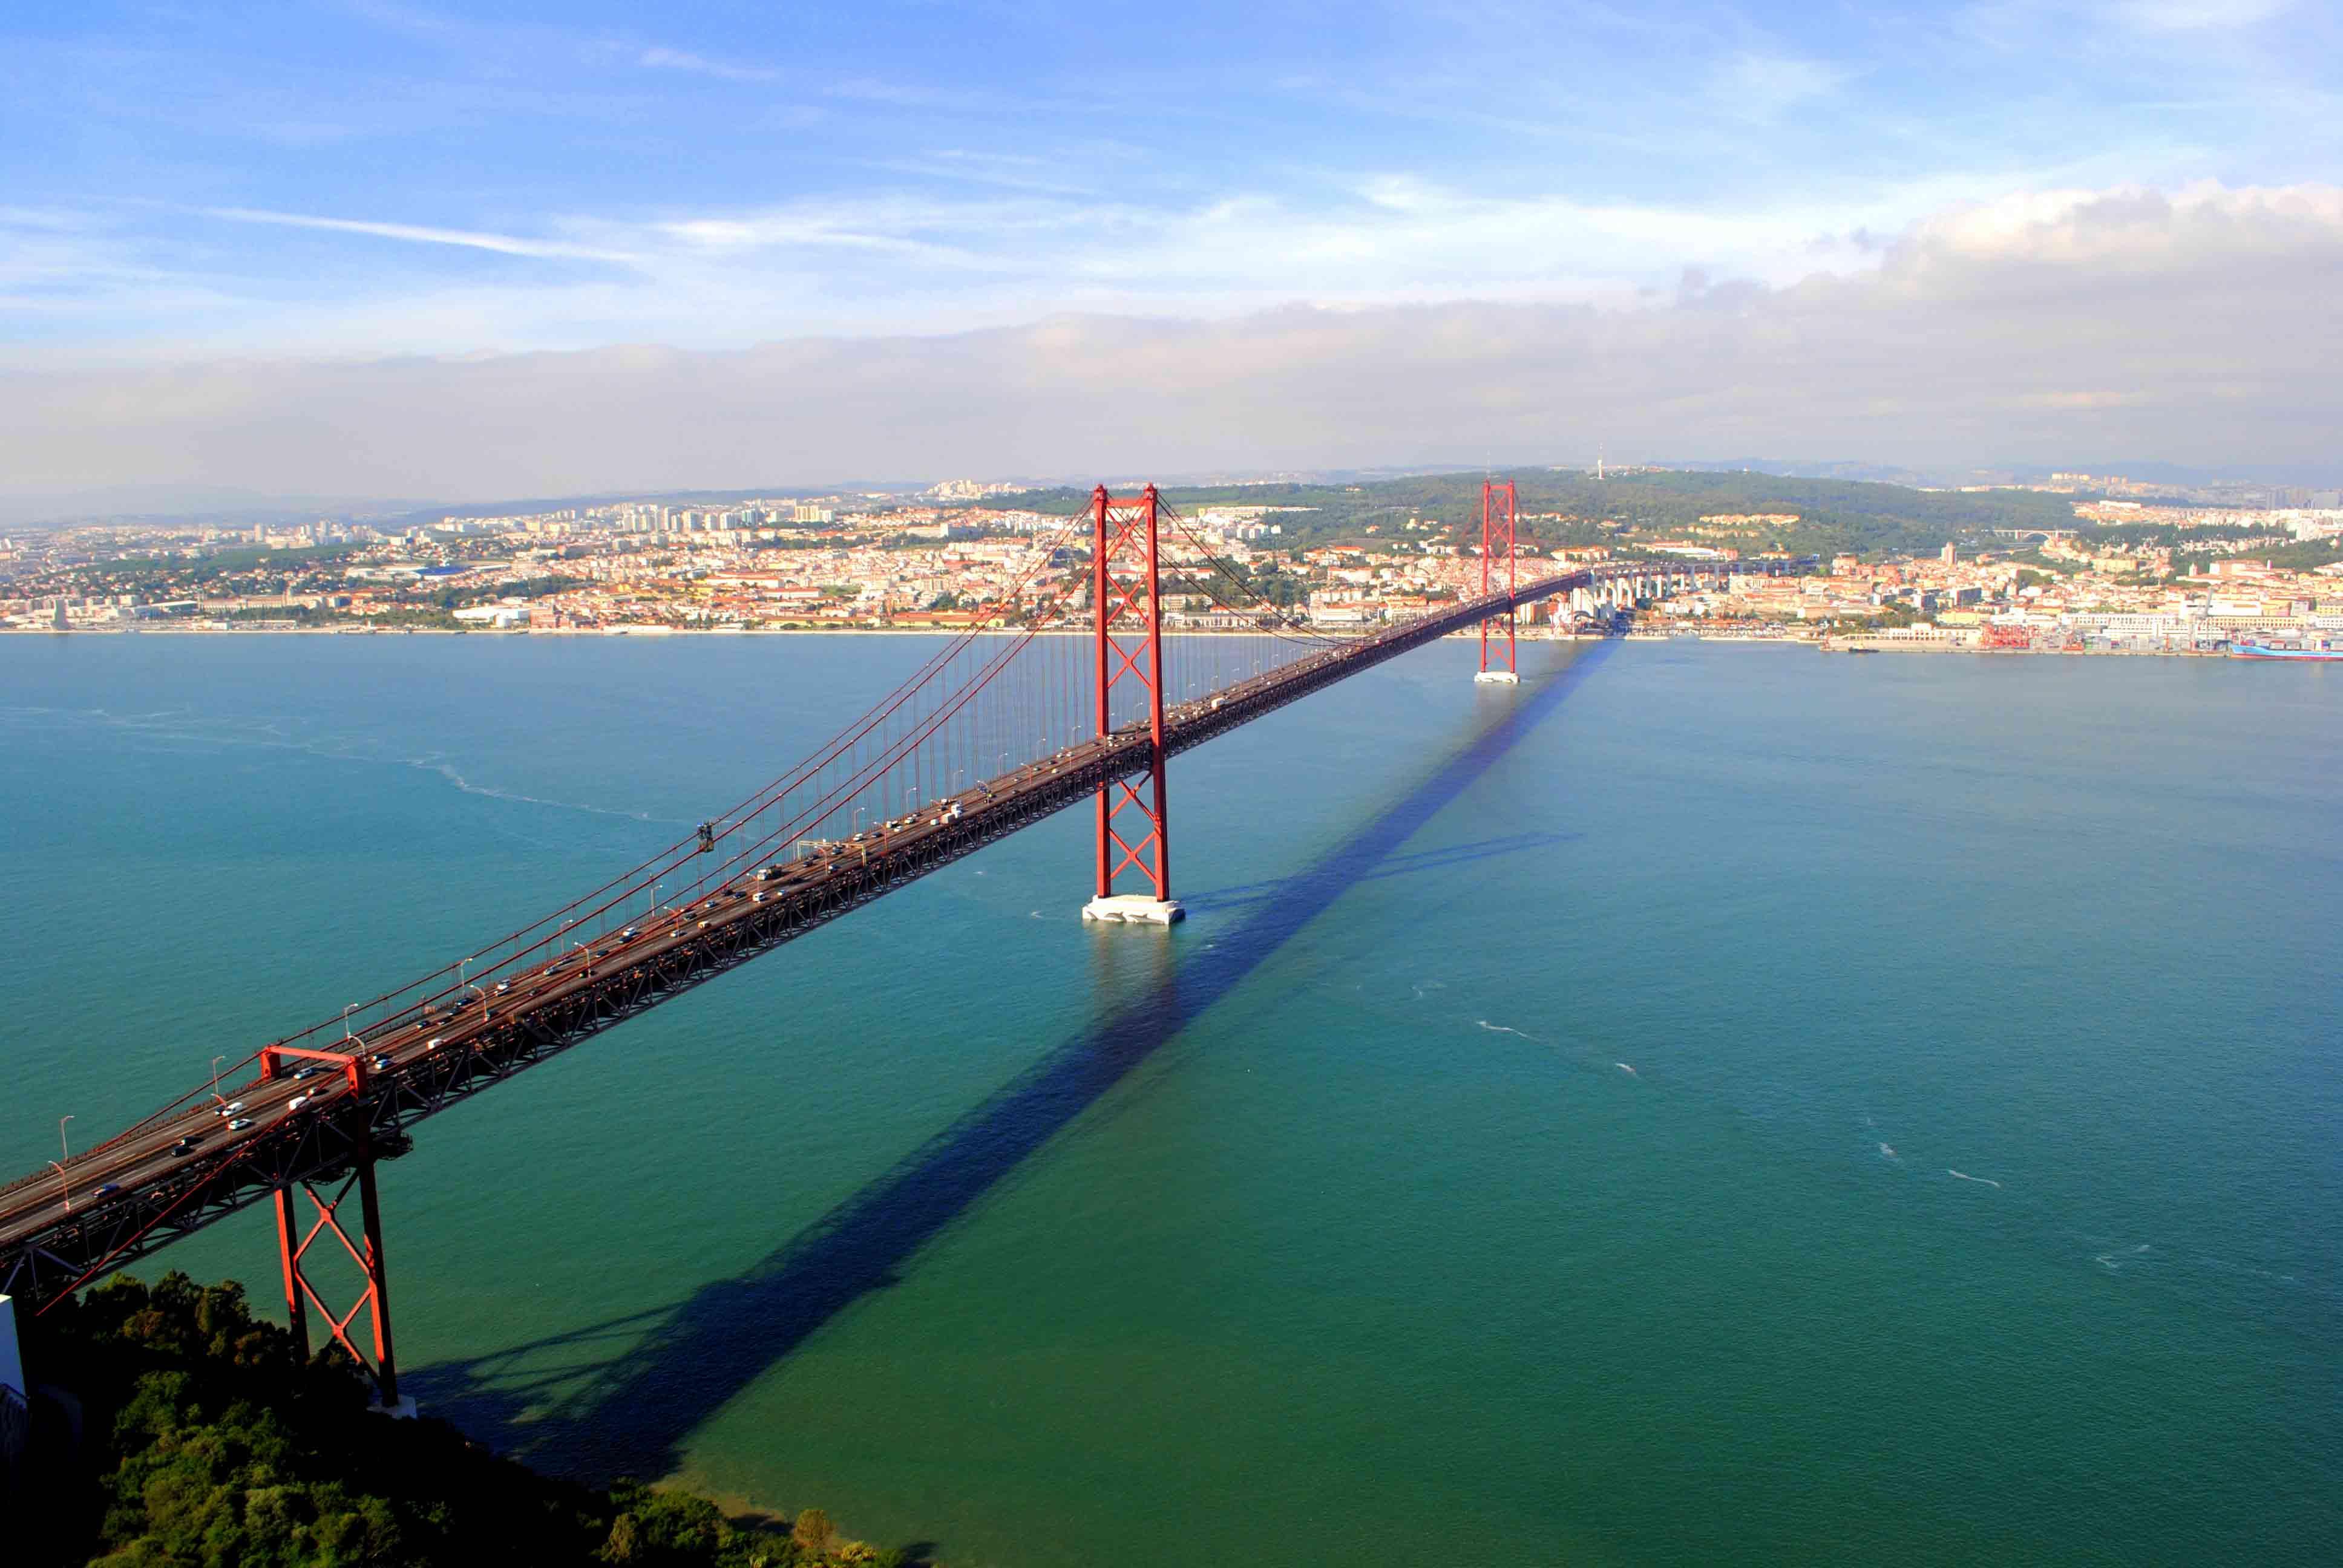 Lisboa I Puente 25 De Abril Cristo Rei